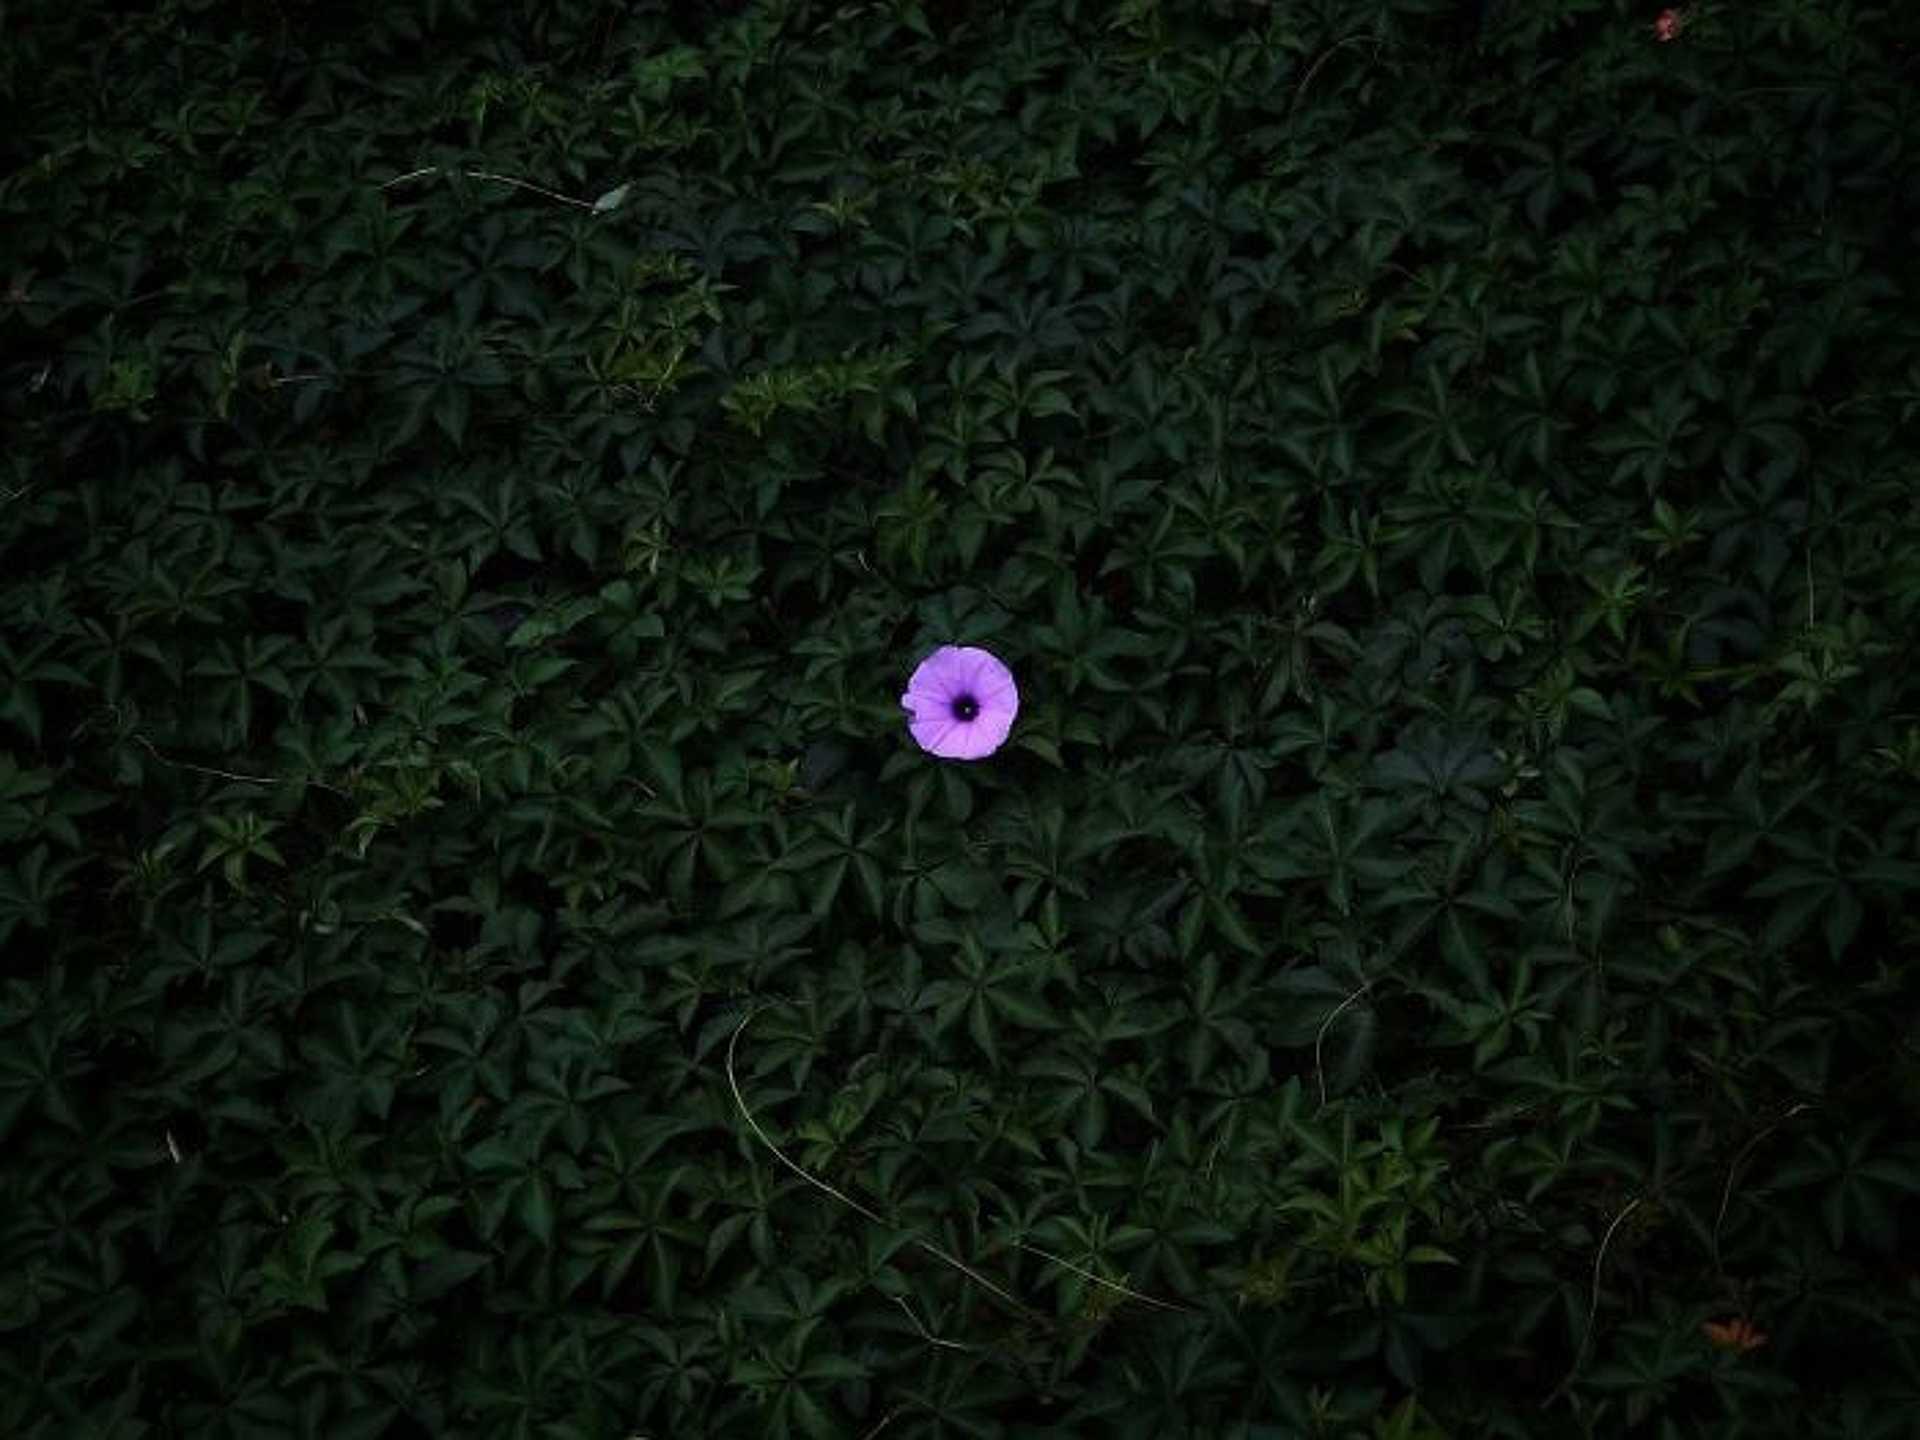 Virág - Peiquan Li: 'Lonely Morning Glory'